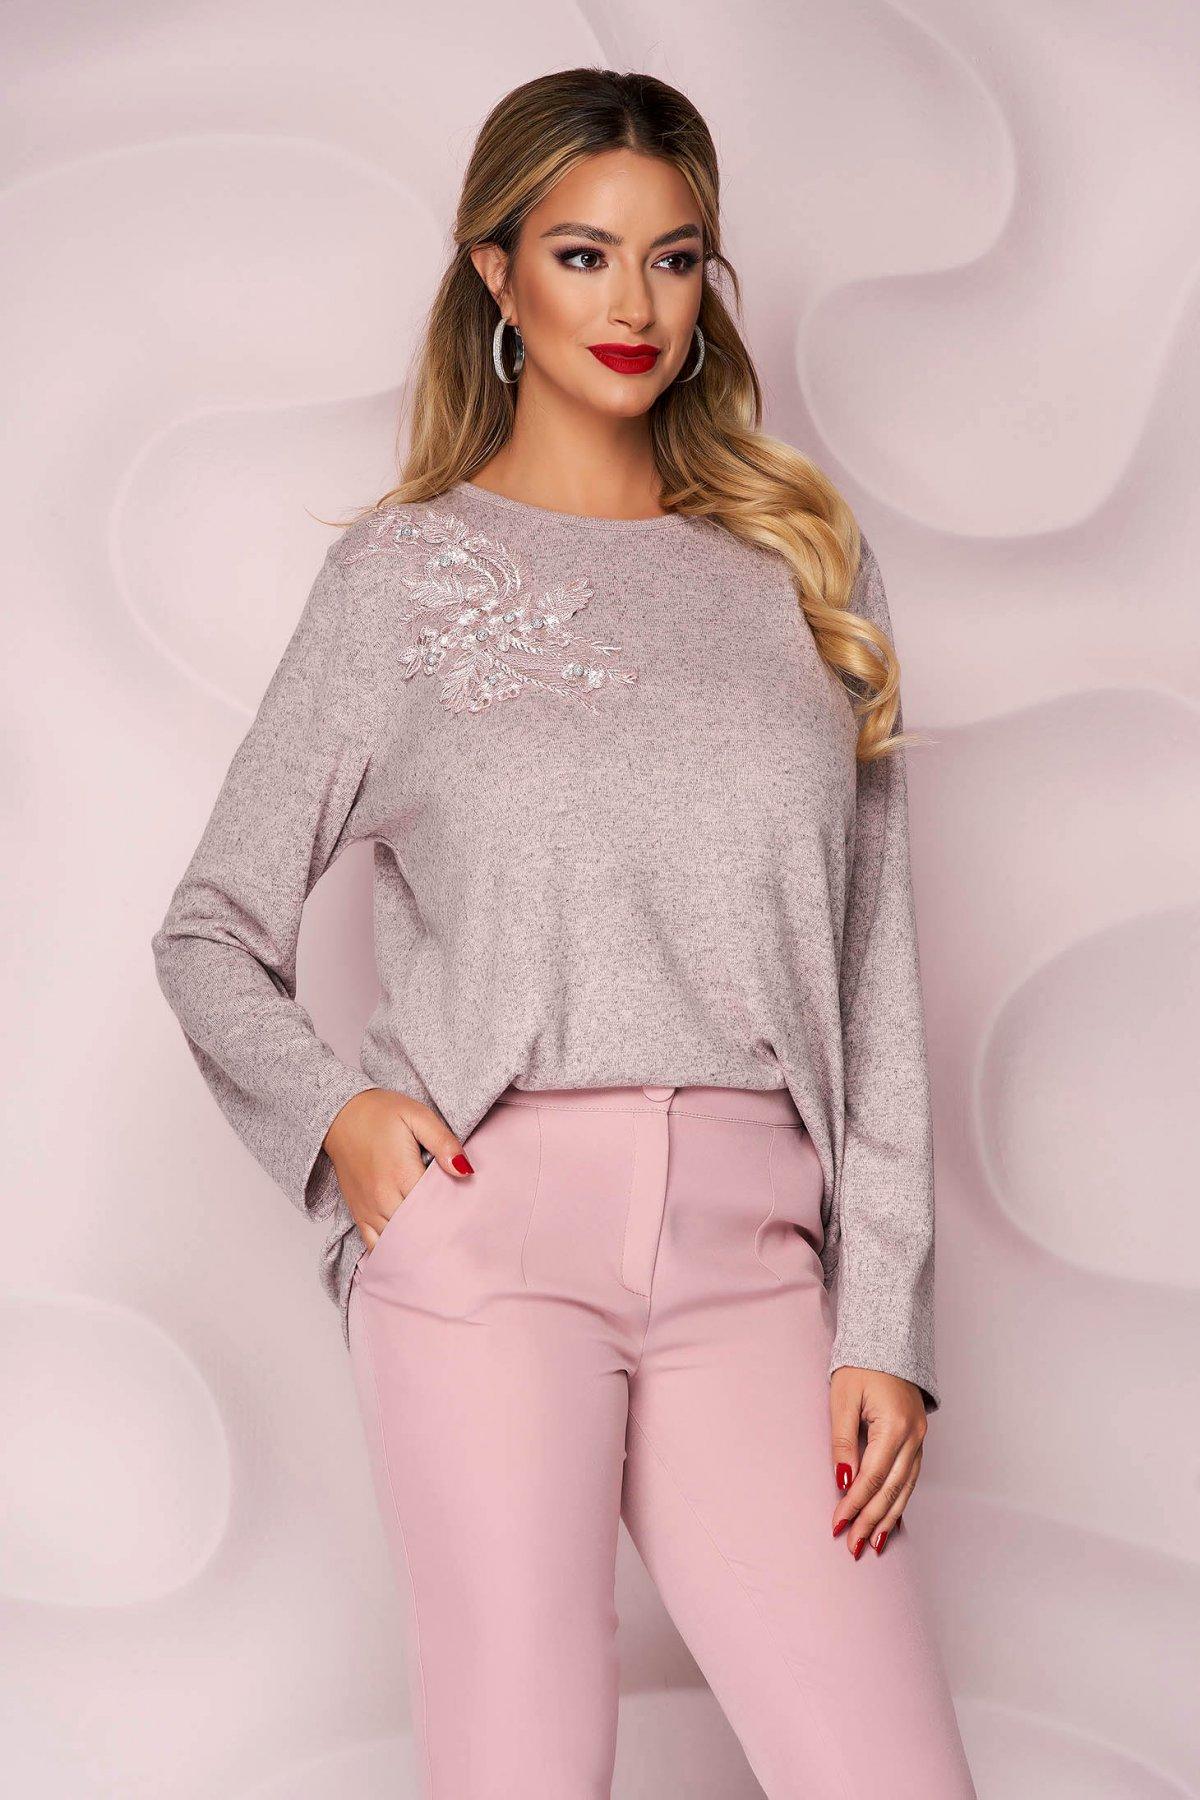 Bluza dama Lady Pandora roz prafuit office cu croi larg din material tricotat elastic si subtire si broderie florala